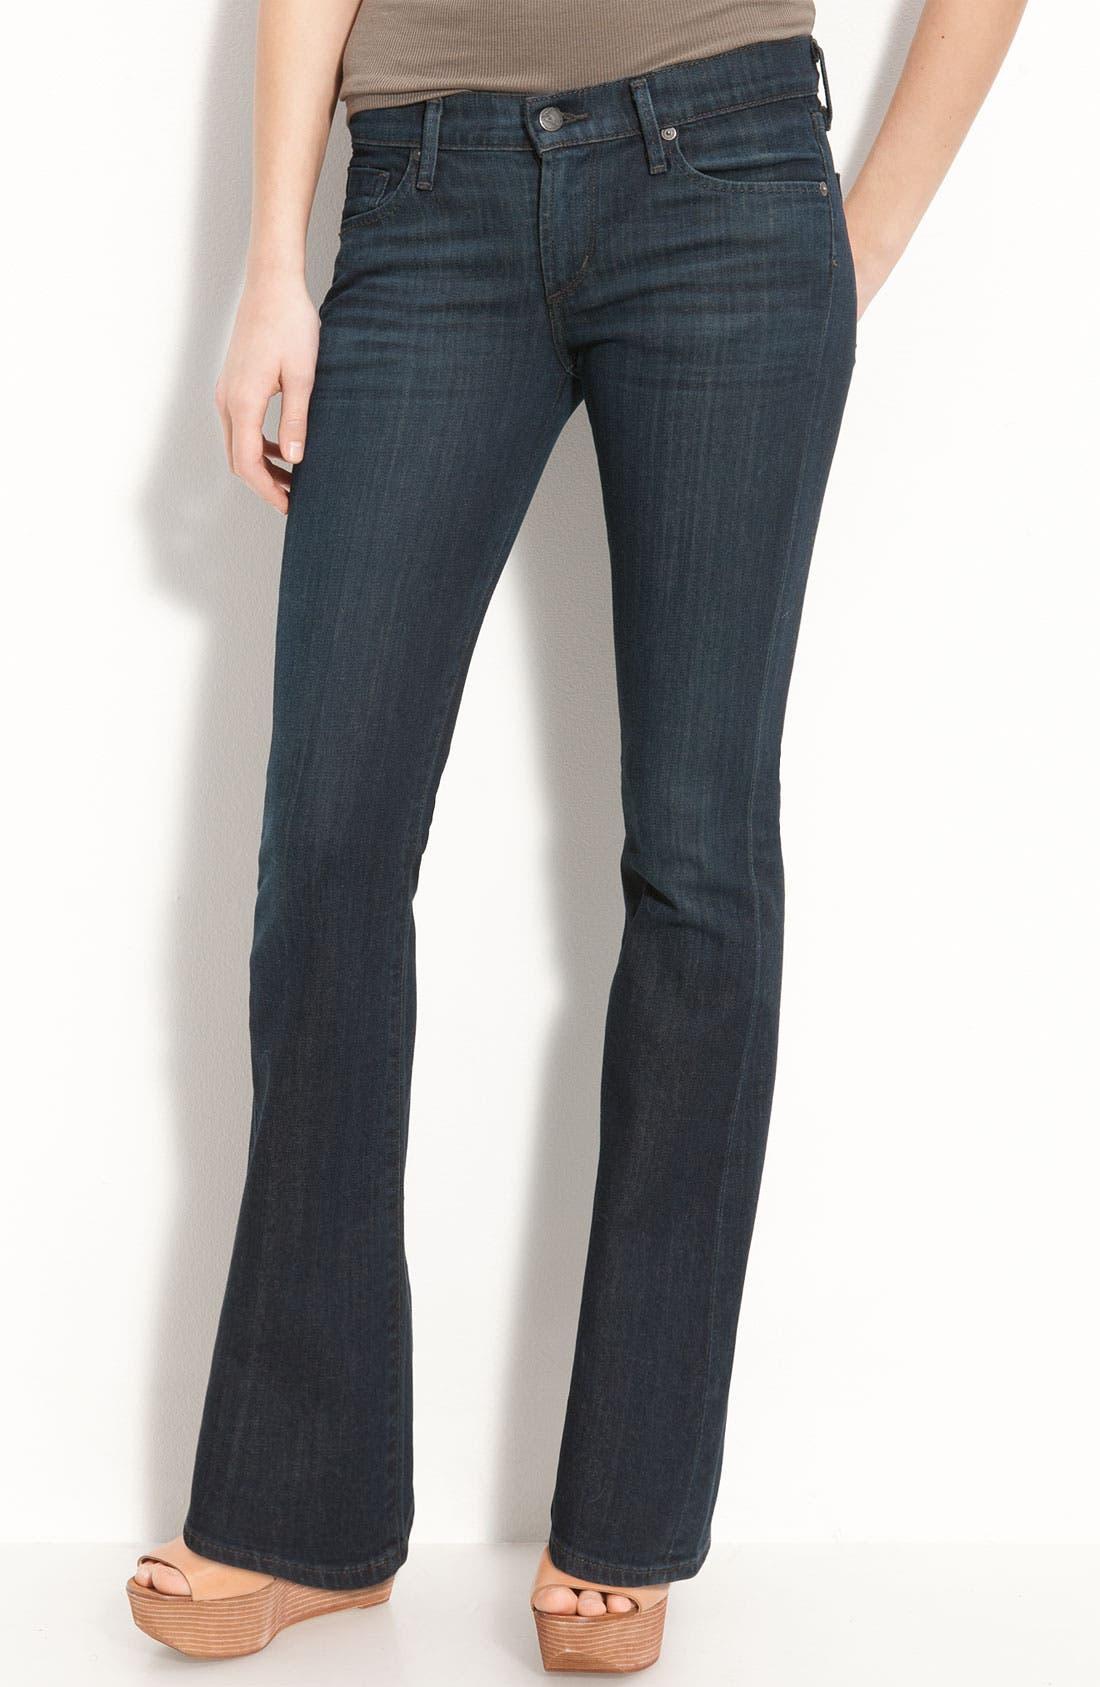 Alternate Image 2  - Citizens of Humanity 'Dita' Bootcut Jeans (Jupiter Wash) (Petite)